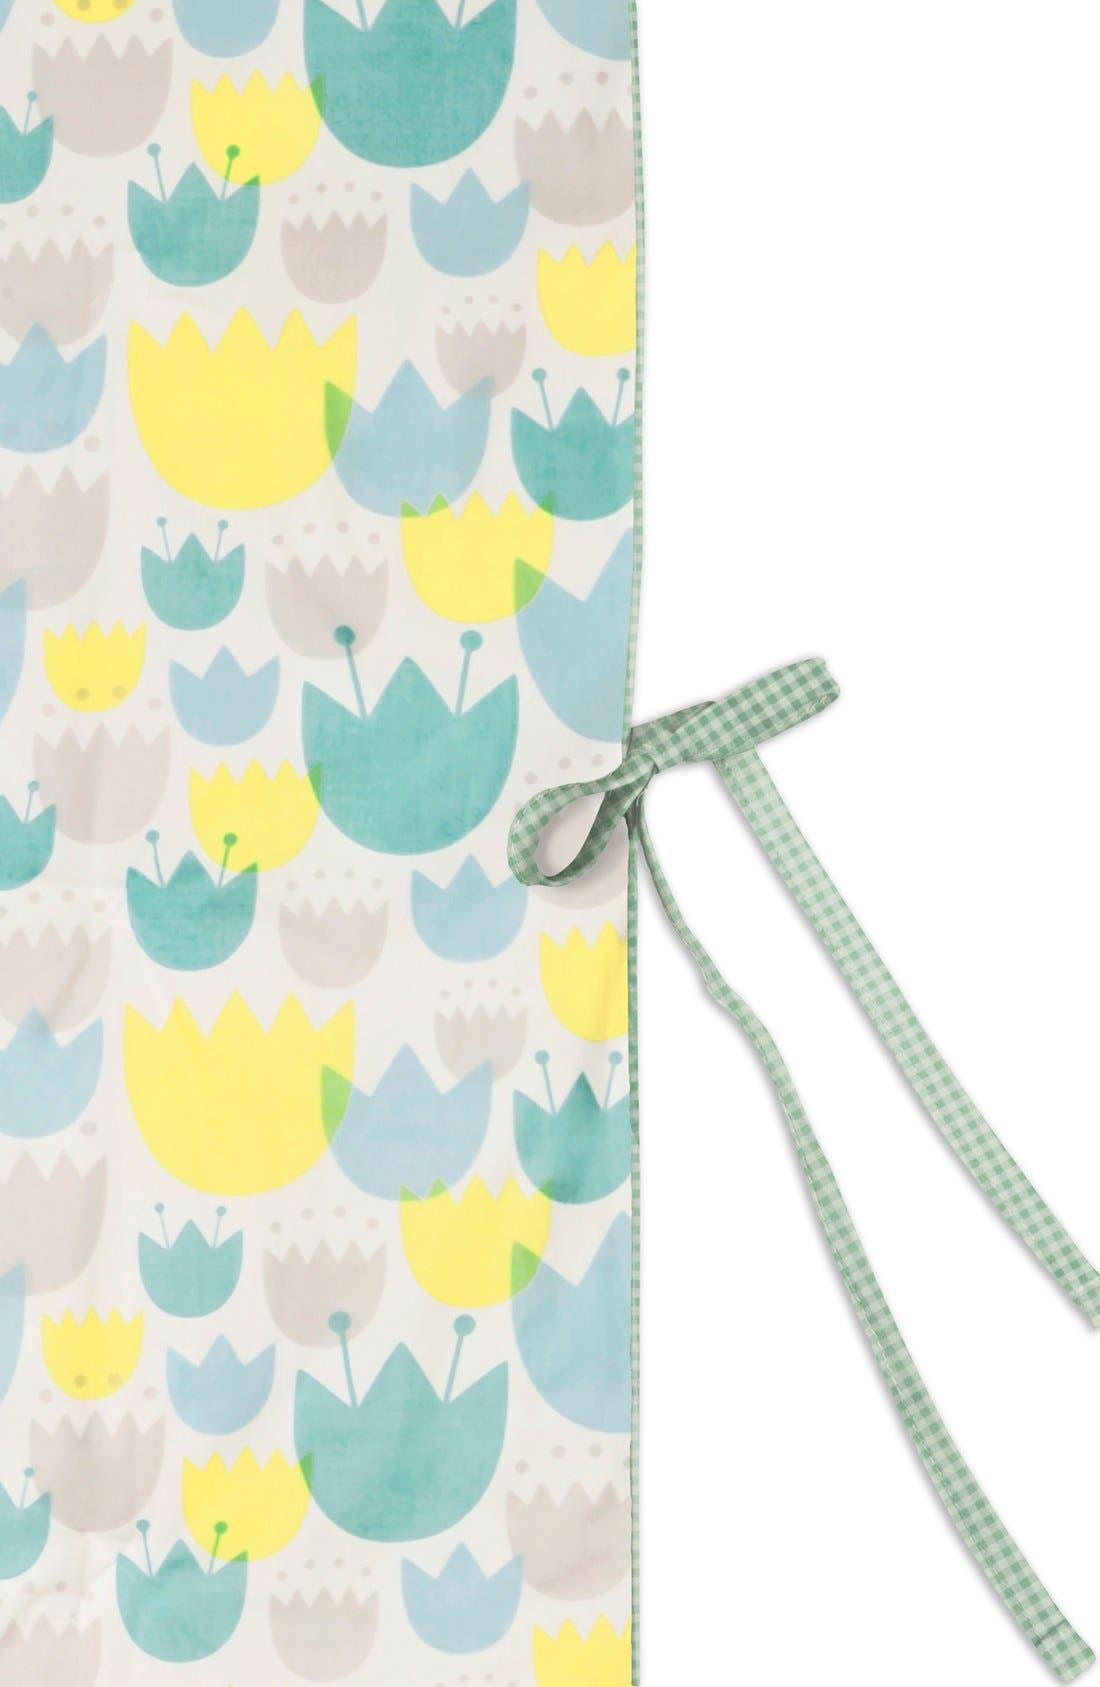 'Garden' Crib Sheet, Crib Skirt, Stroller Blanket & Wall Decals,                             Alternate thumbnail 4, color,                             Blue